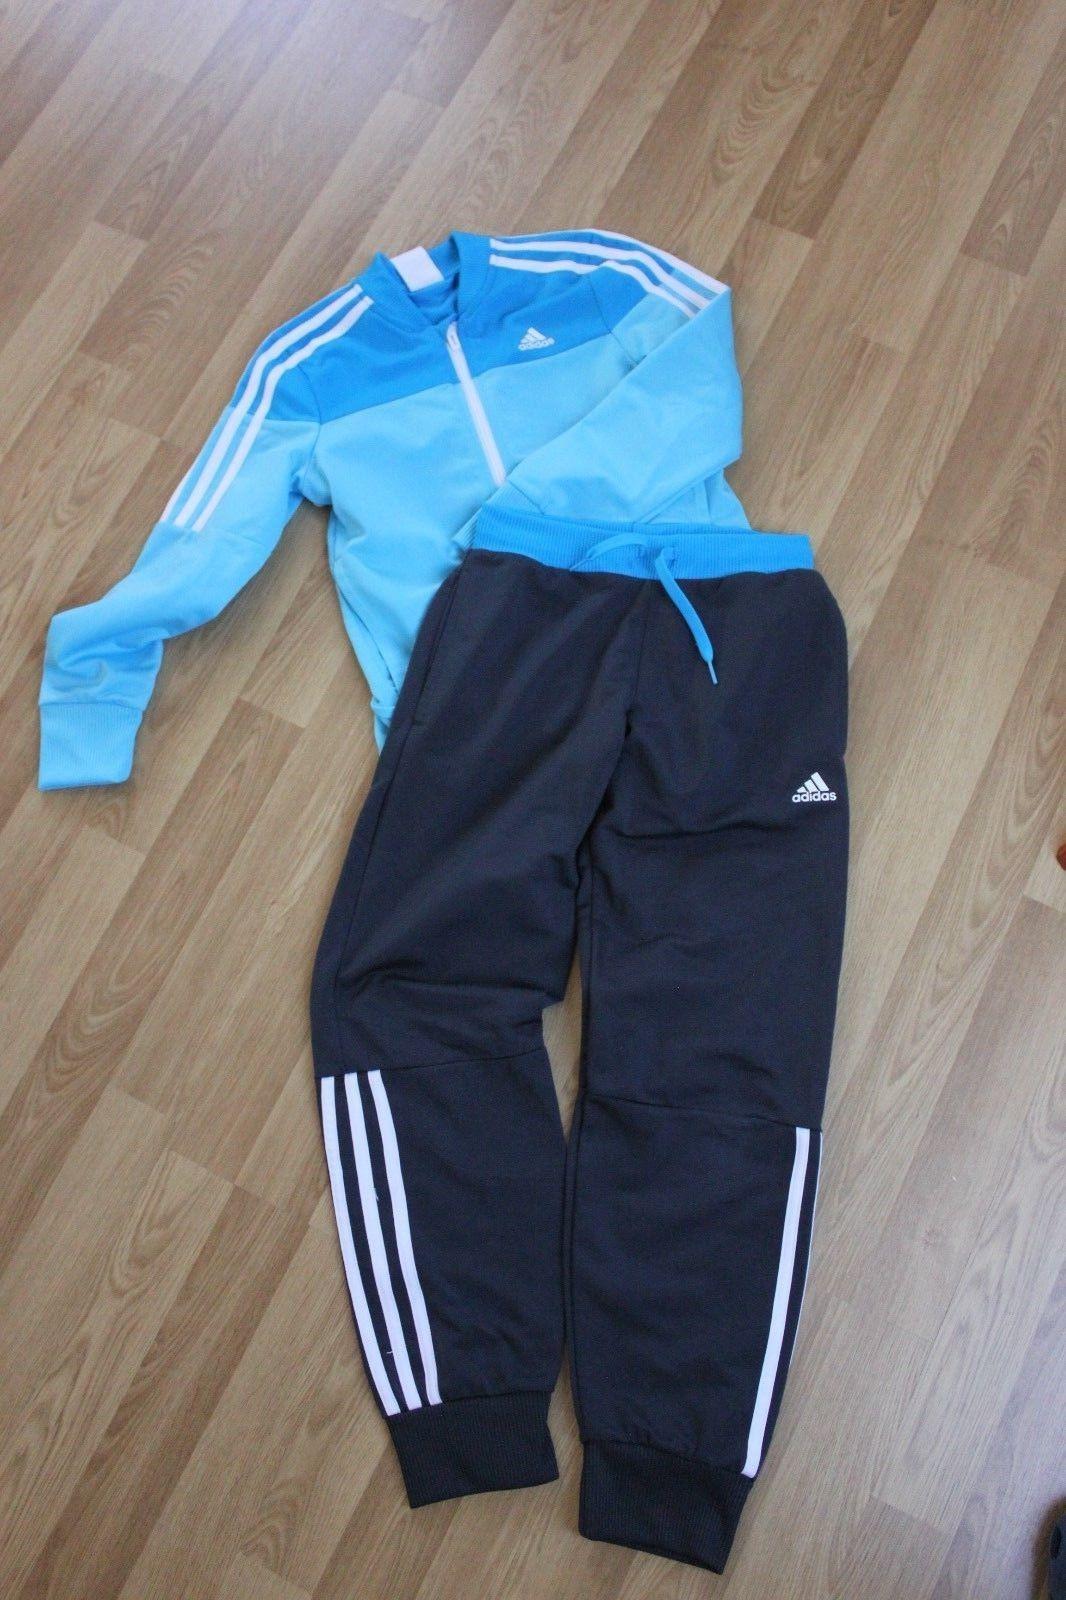 Adidas Jogginganzug Trainingsanzug Hose Jacke Gr. 140 (blau-töne)